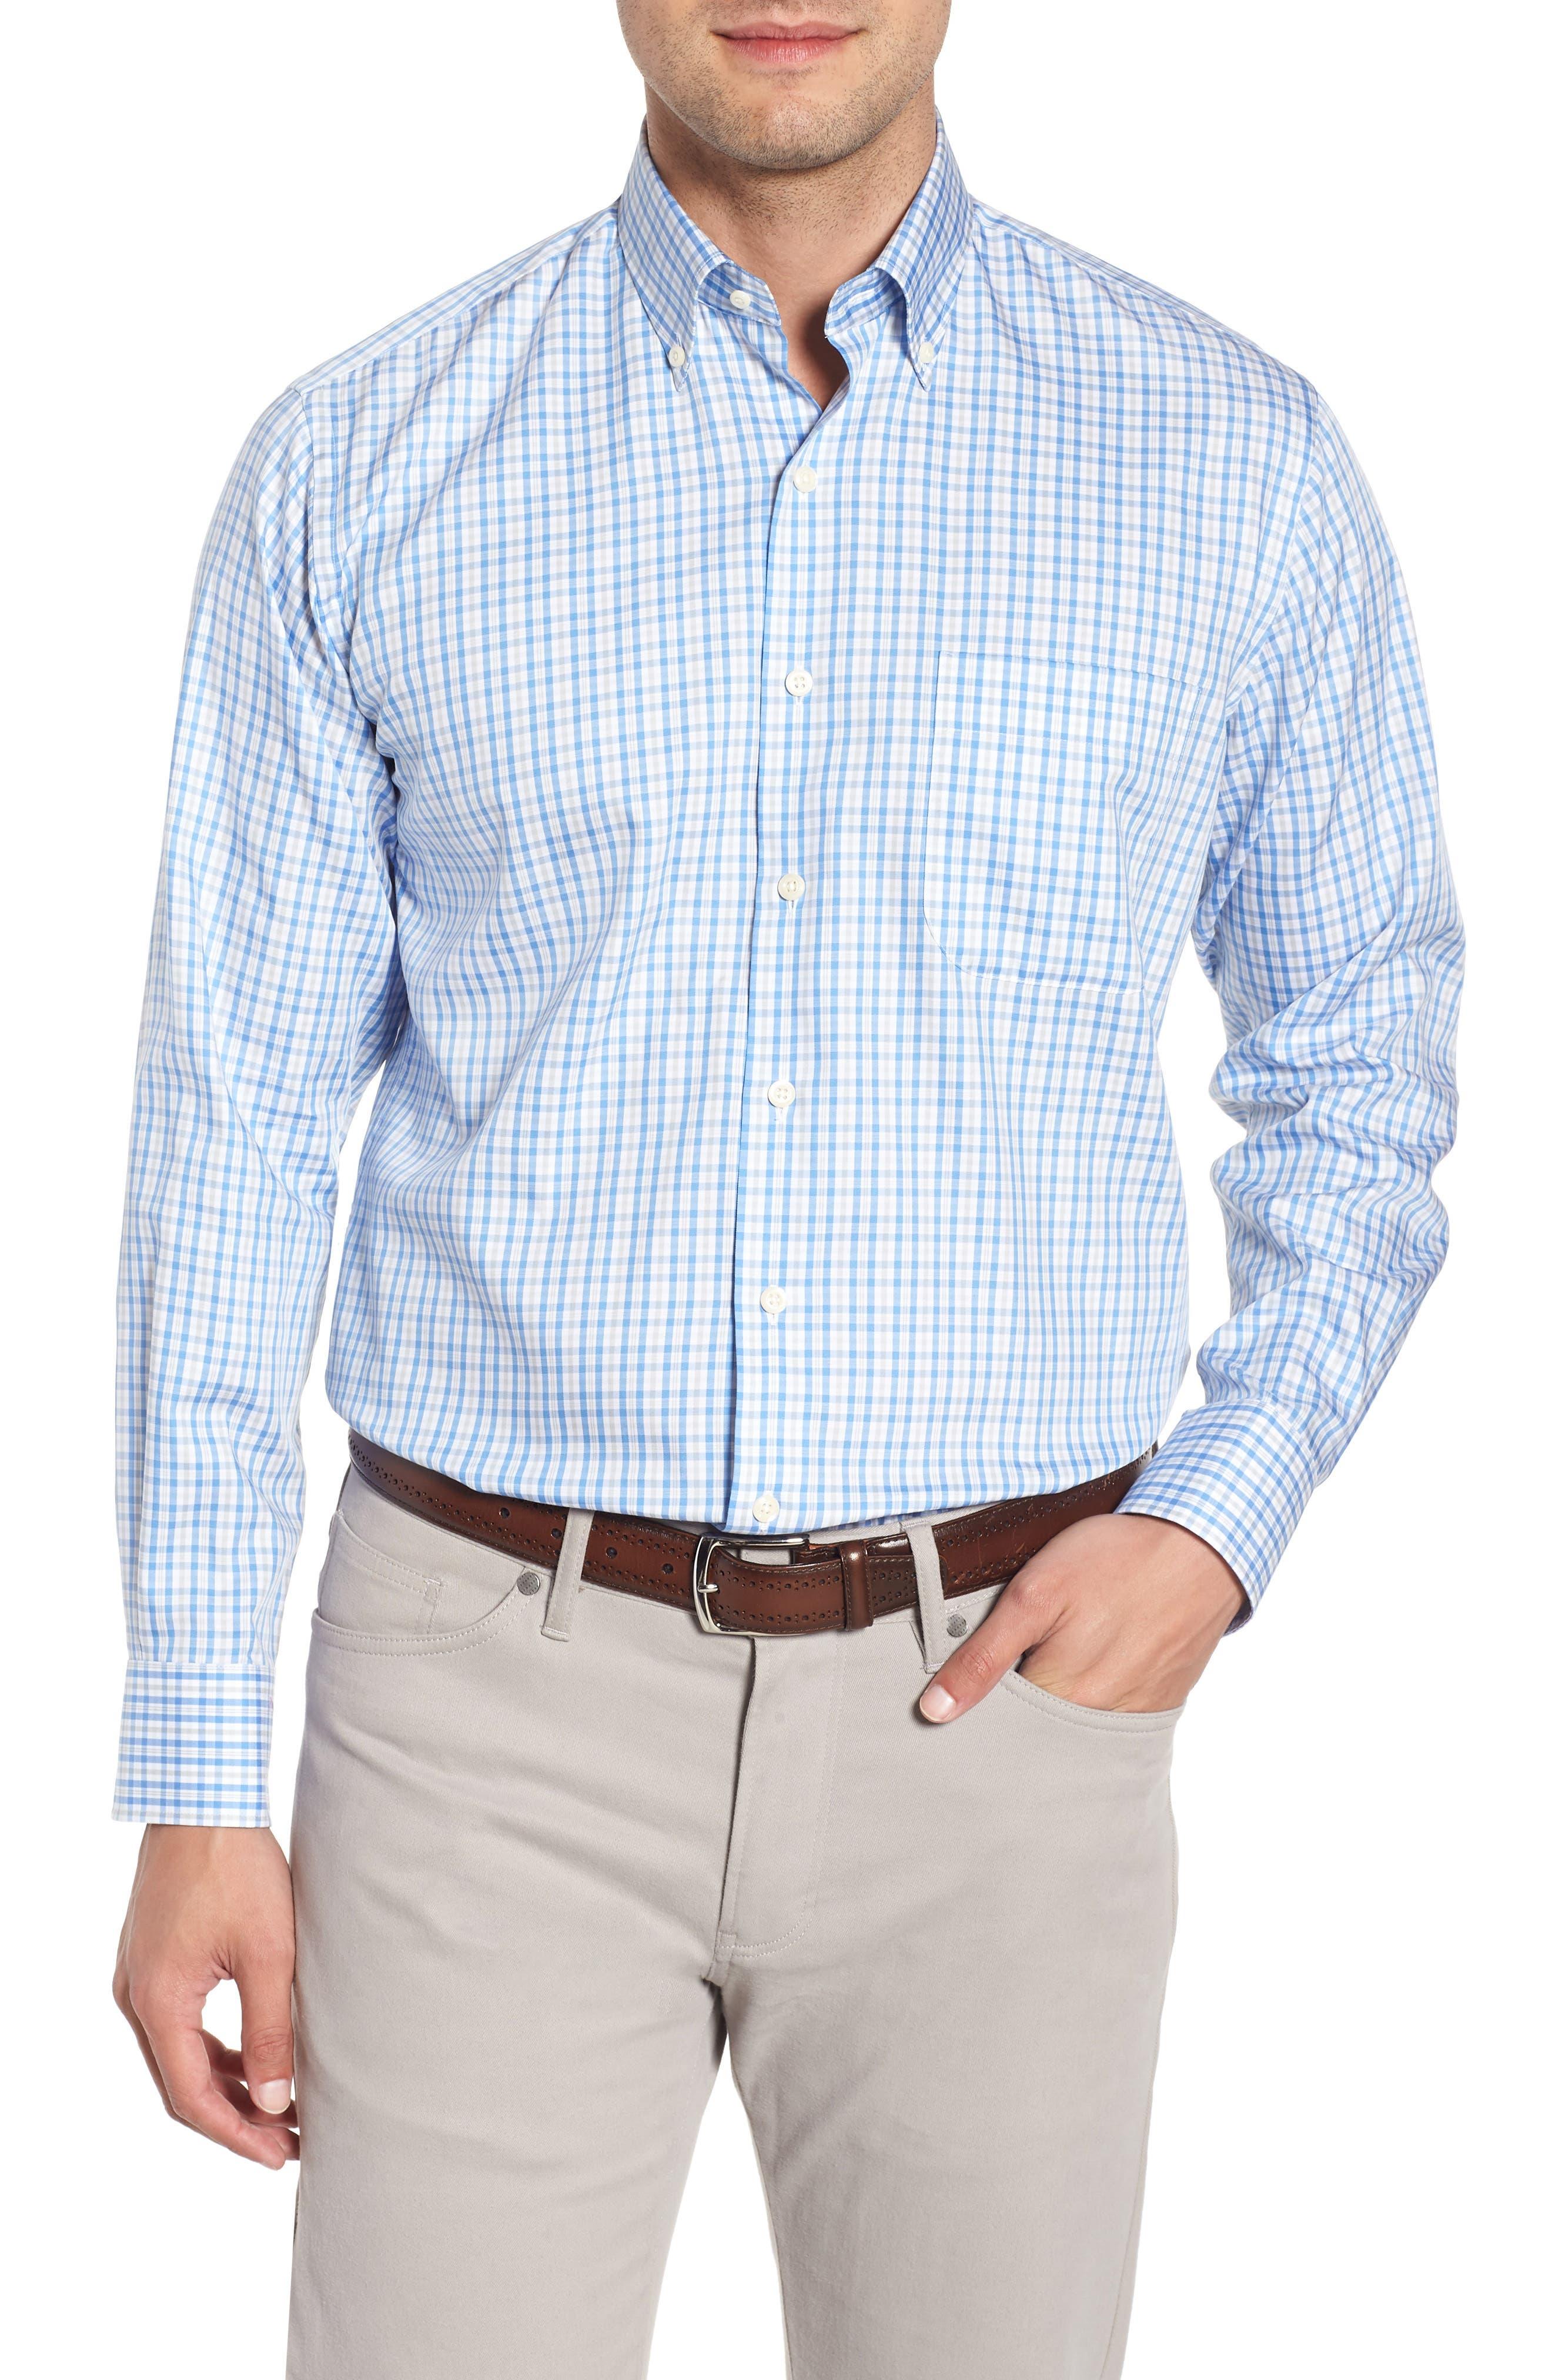 PETER MILLAR,                             Crown Soft First Hill Plaid Sport Shirt,                             Main thumbnail 1, color,                             485